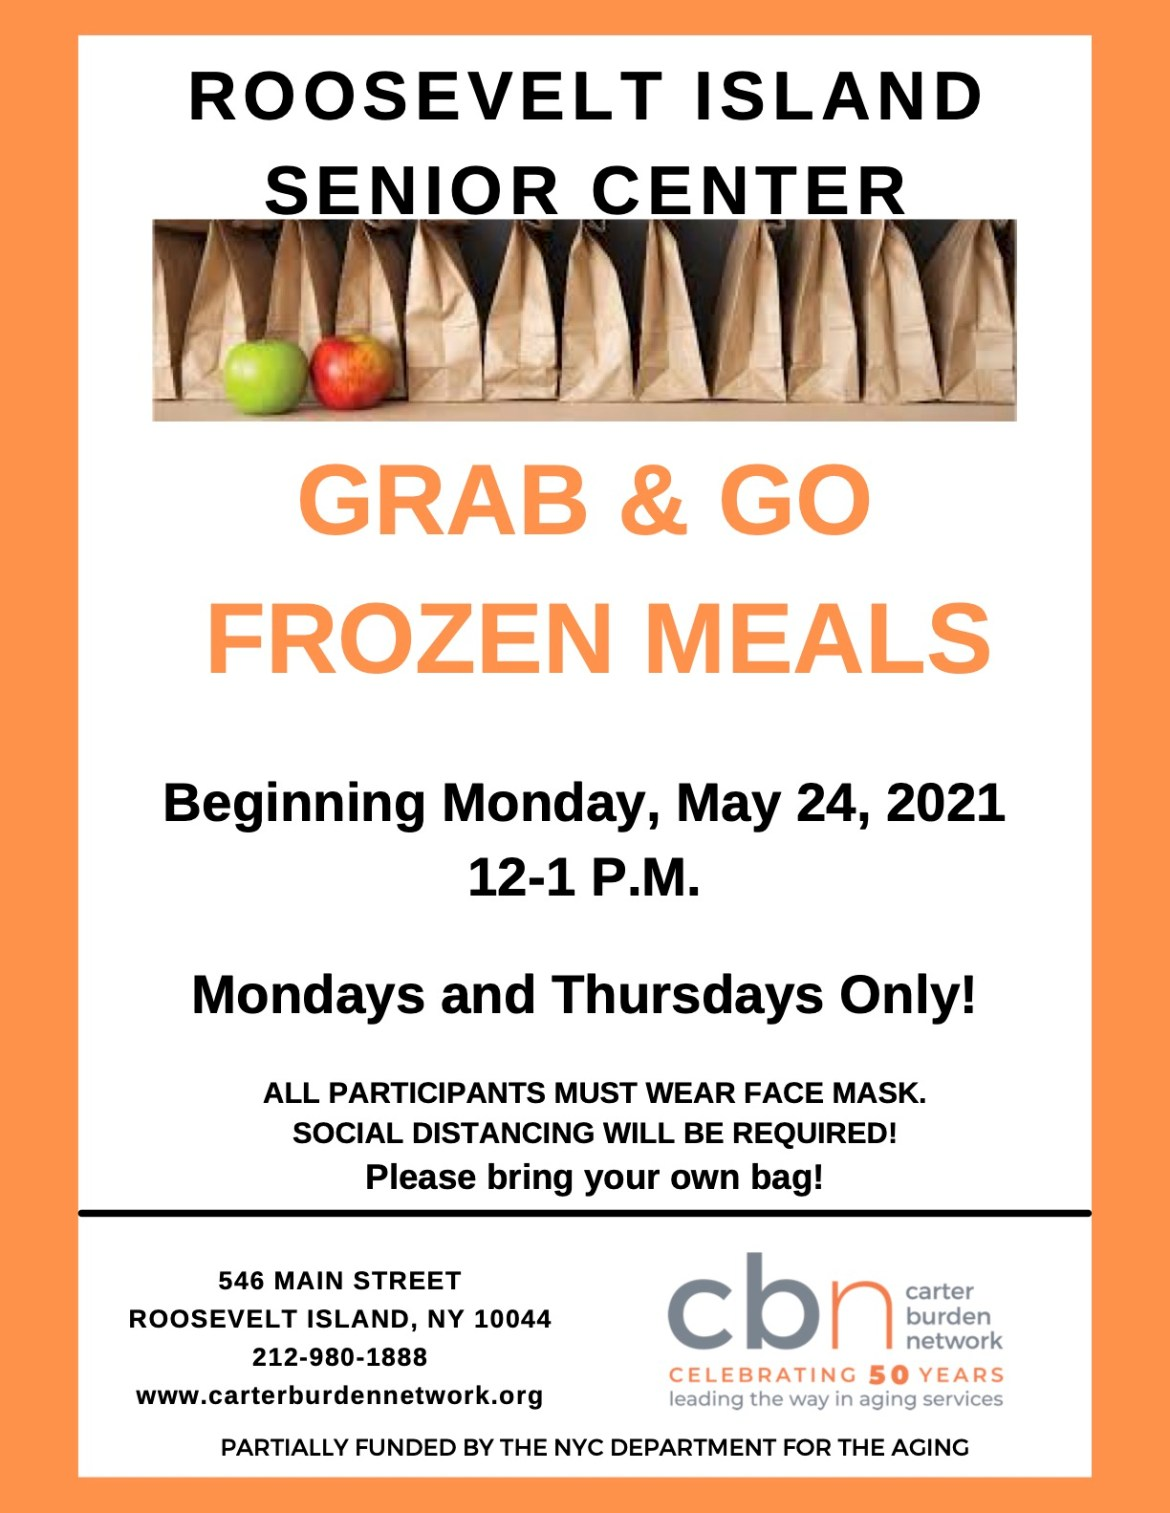 Roosevelt Island Senior Center Stirs with Grab & Go Frozen Meals, Starting Monday